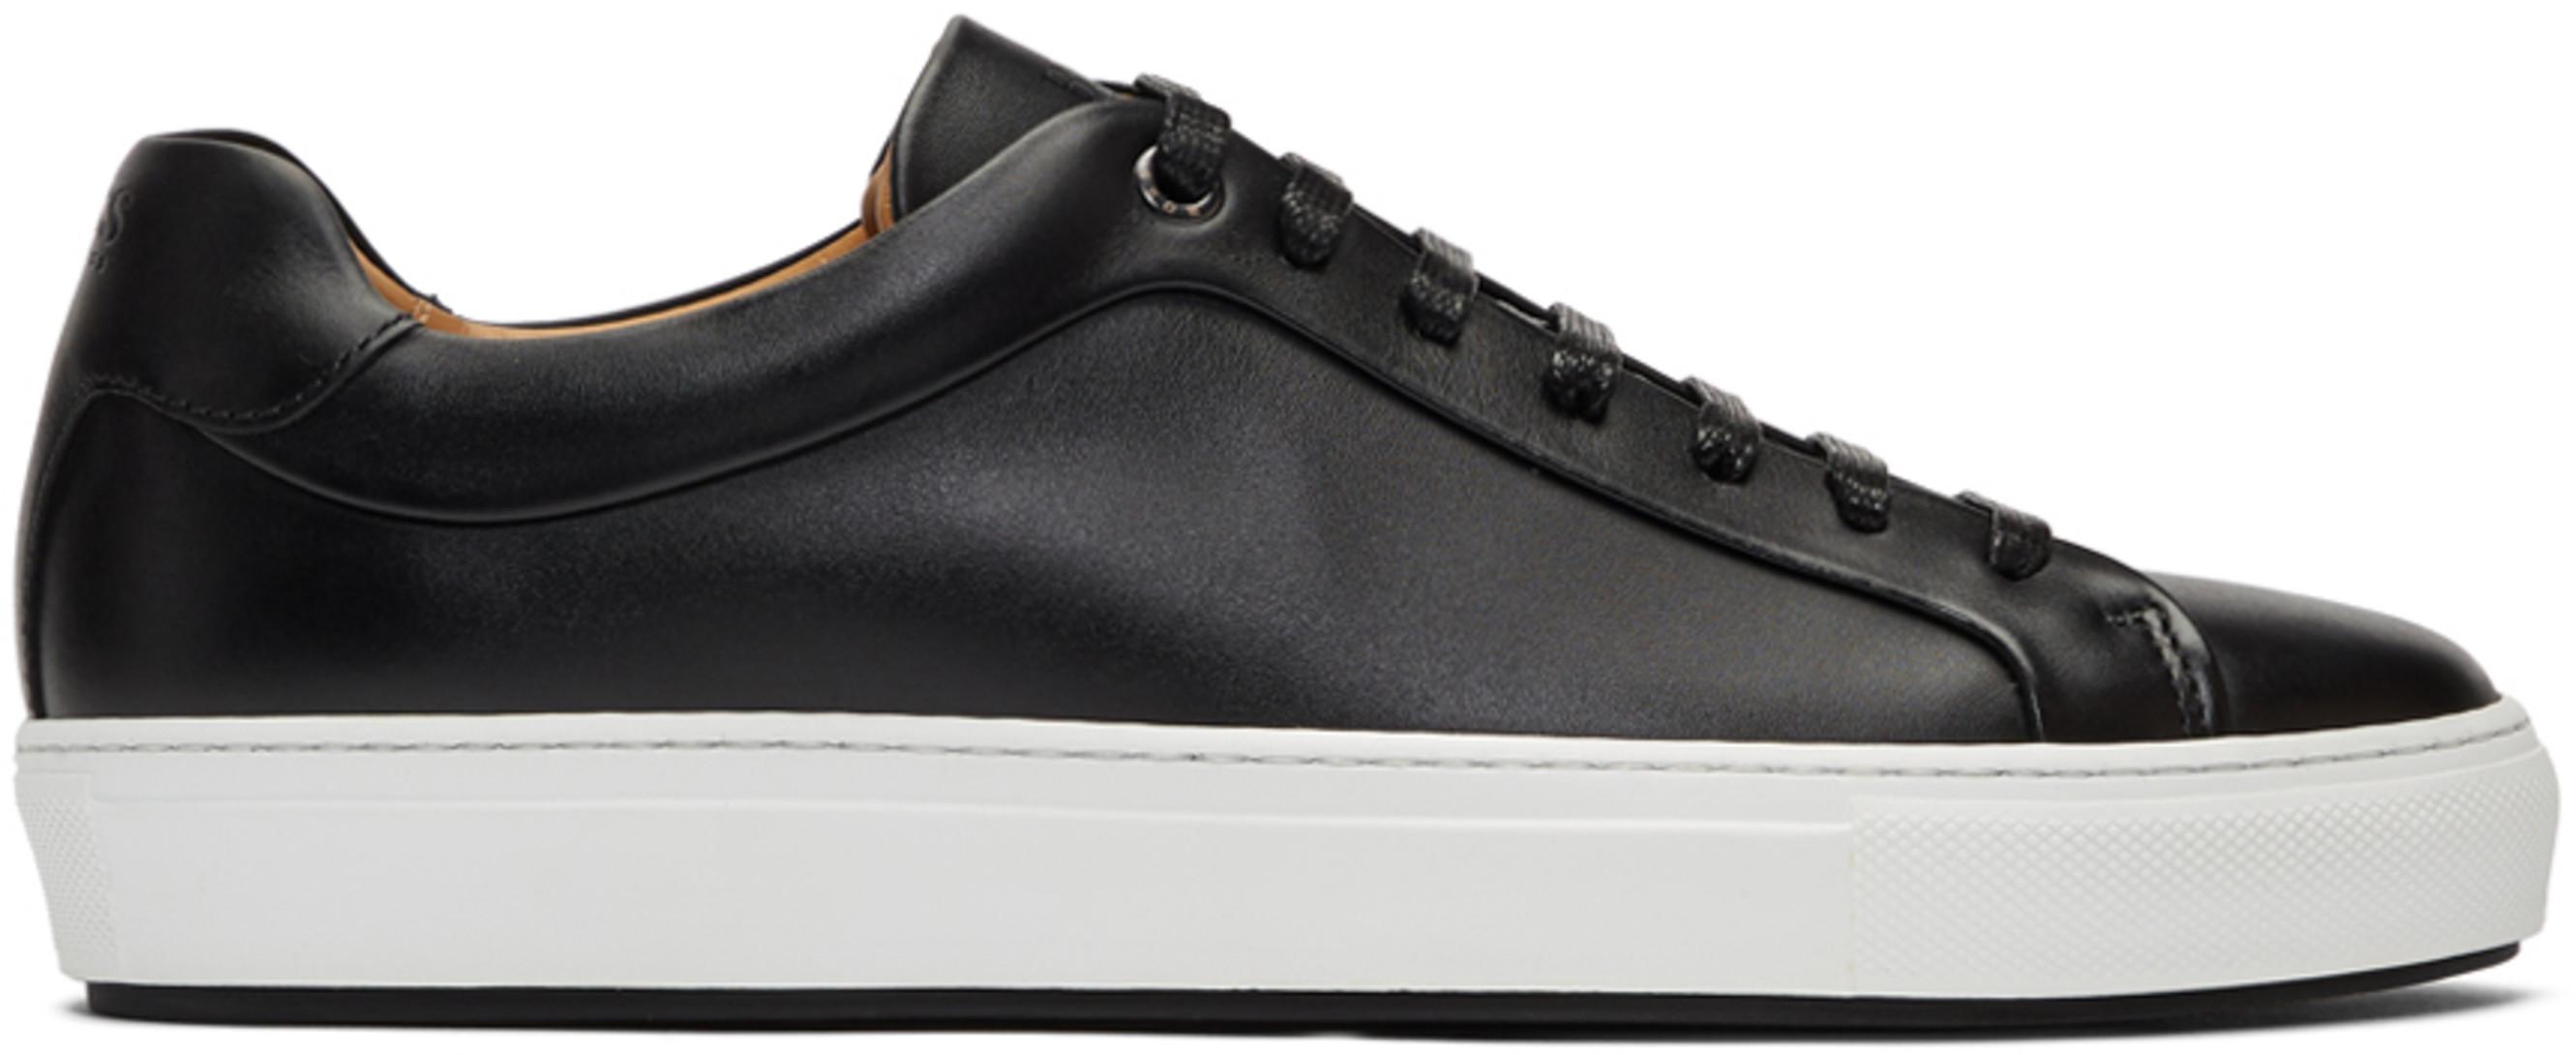 Designer sneakers for Men  193921702c1